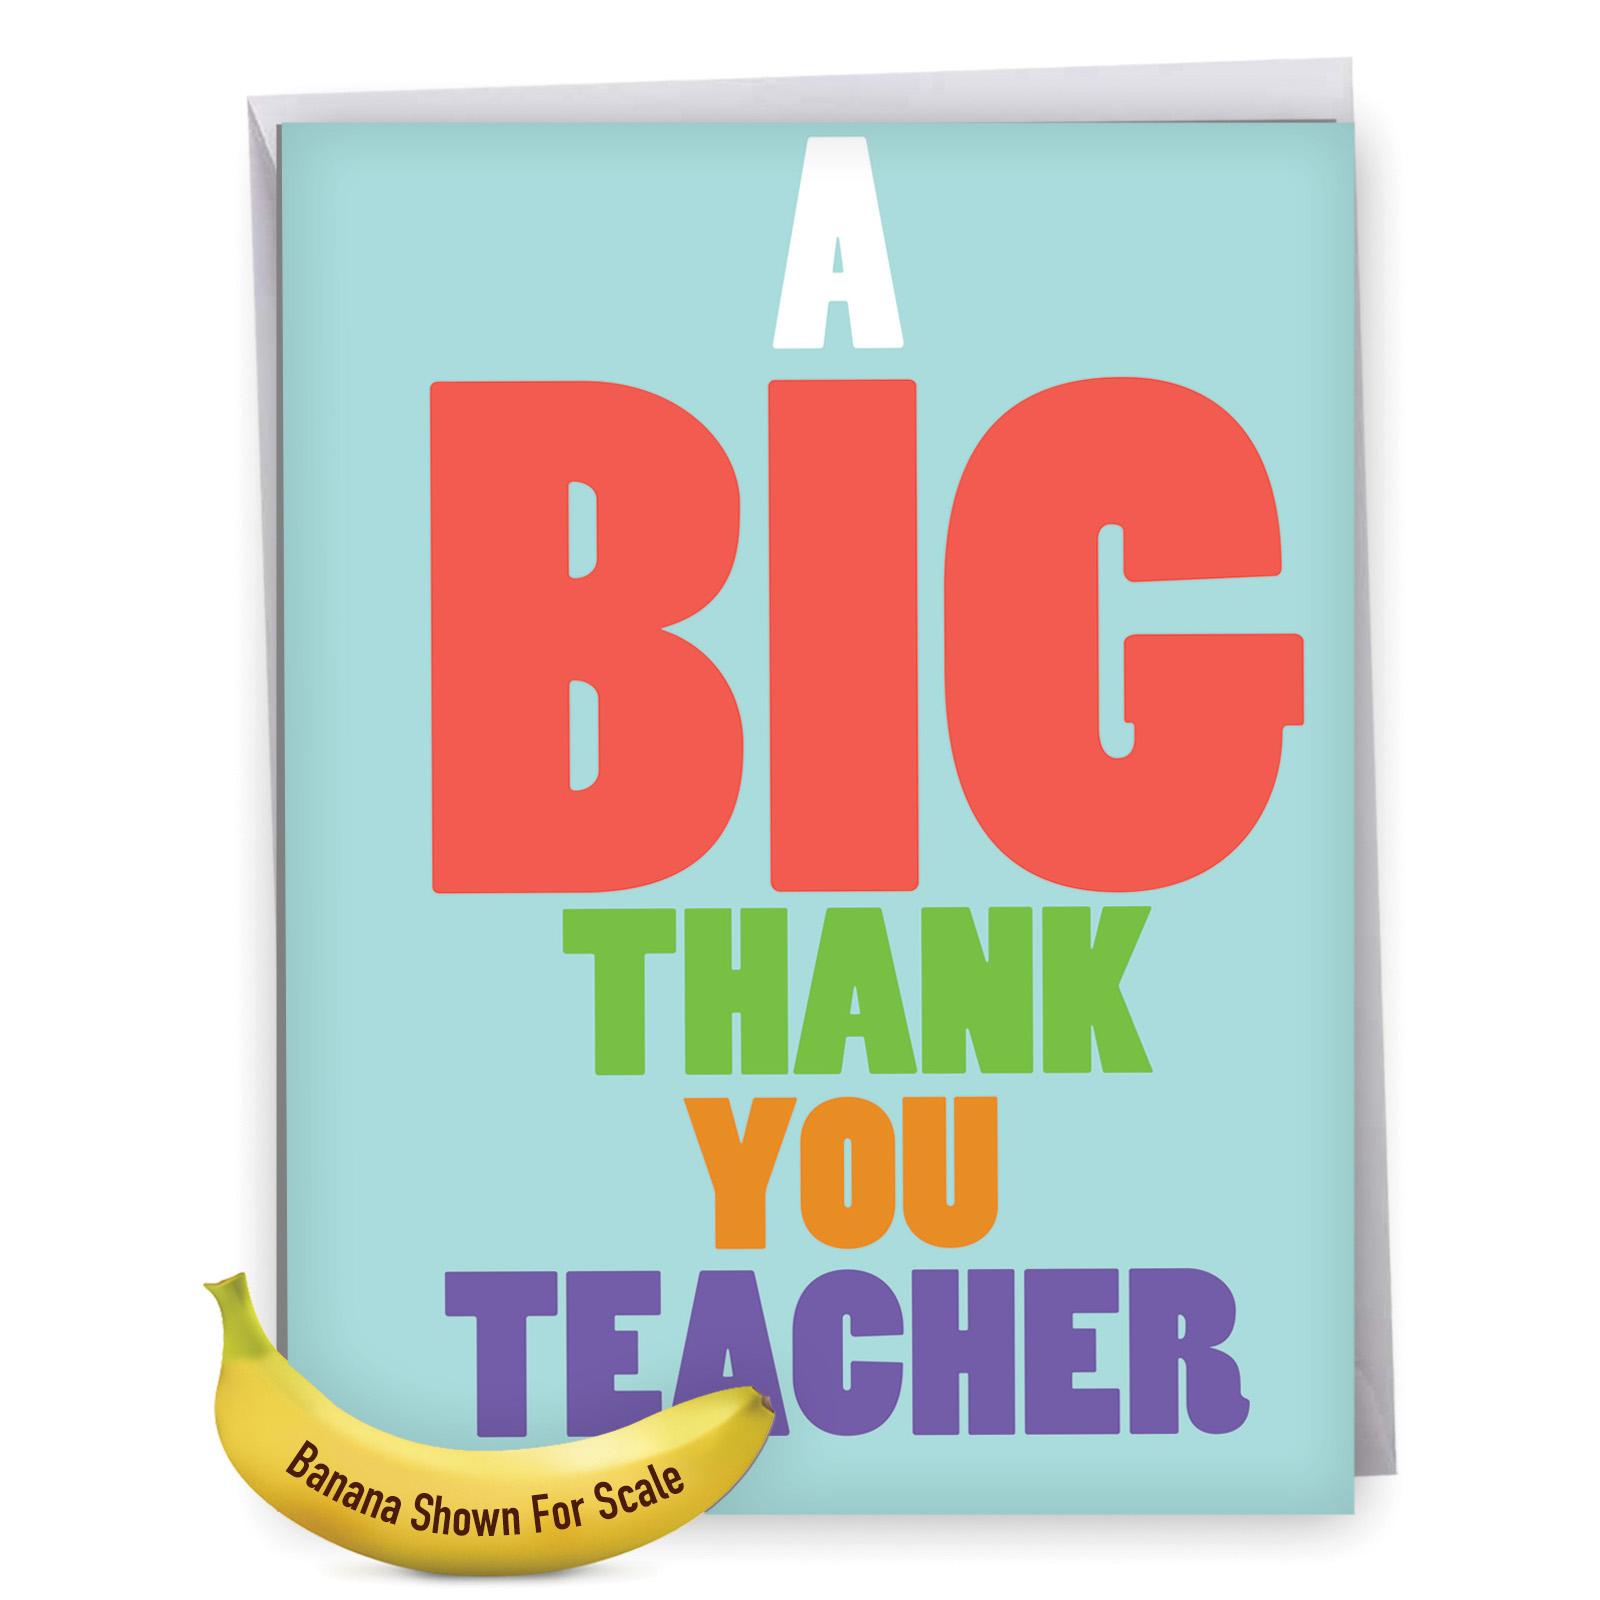 J4631TTG Jumbo Humorous Teacher Thank You Card: 'Big Thank You Teacher' with Envelope